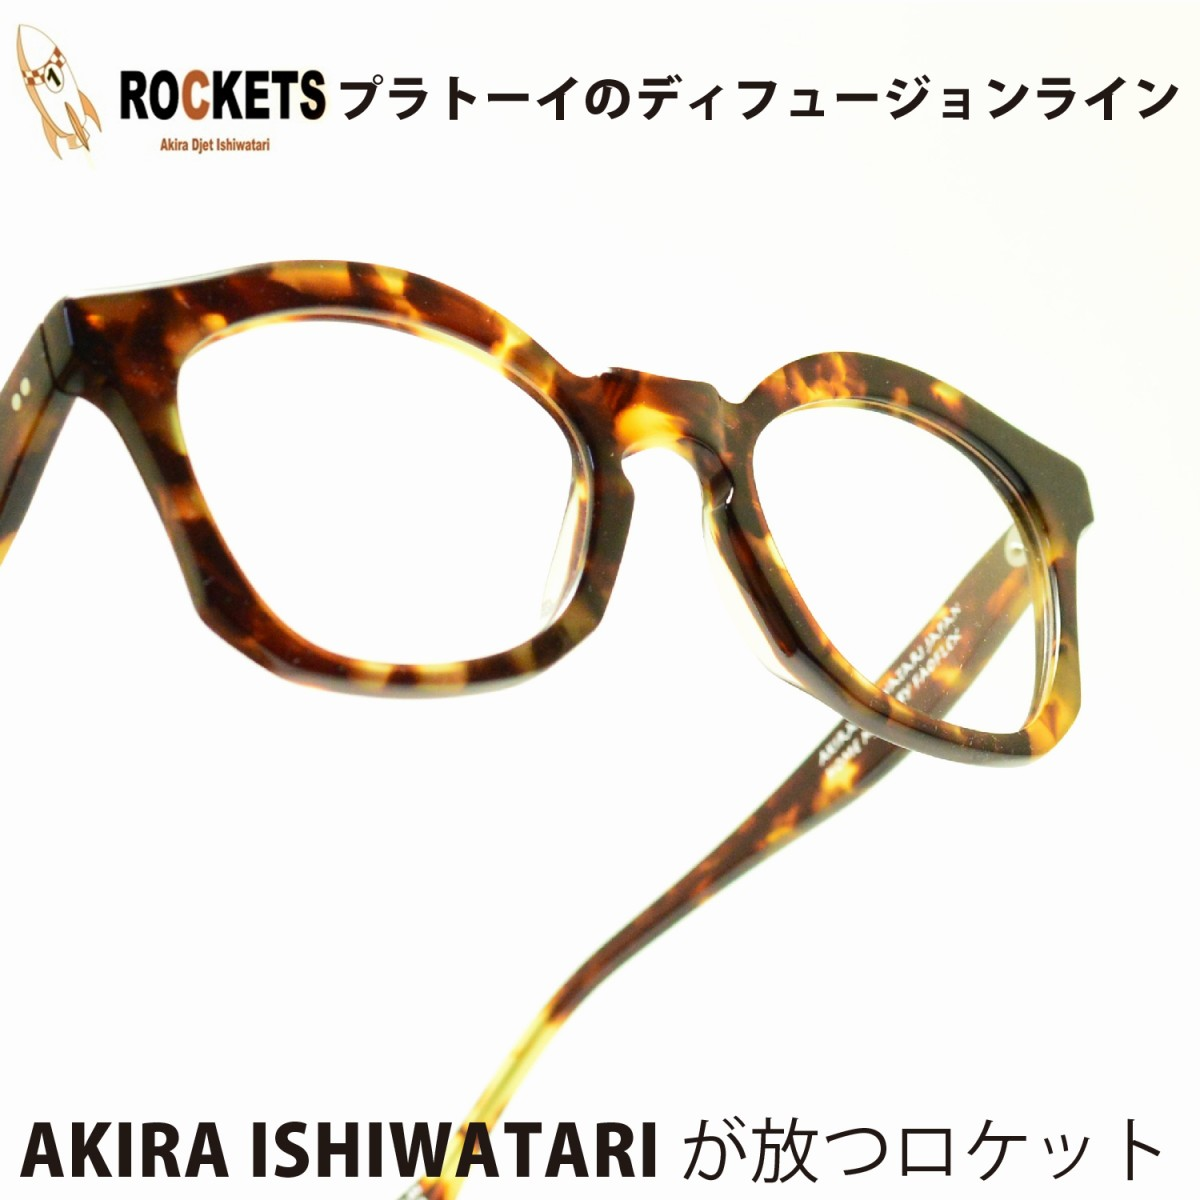 ROCKETS COM COL-FAULINメガネ 眼鏡 めがね メンズ レディース おしゃれ ブランド 人気 おすすめ フレーム 流行り 度付き レンズ